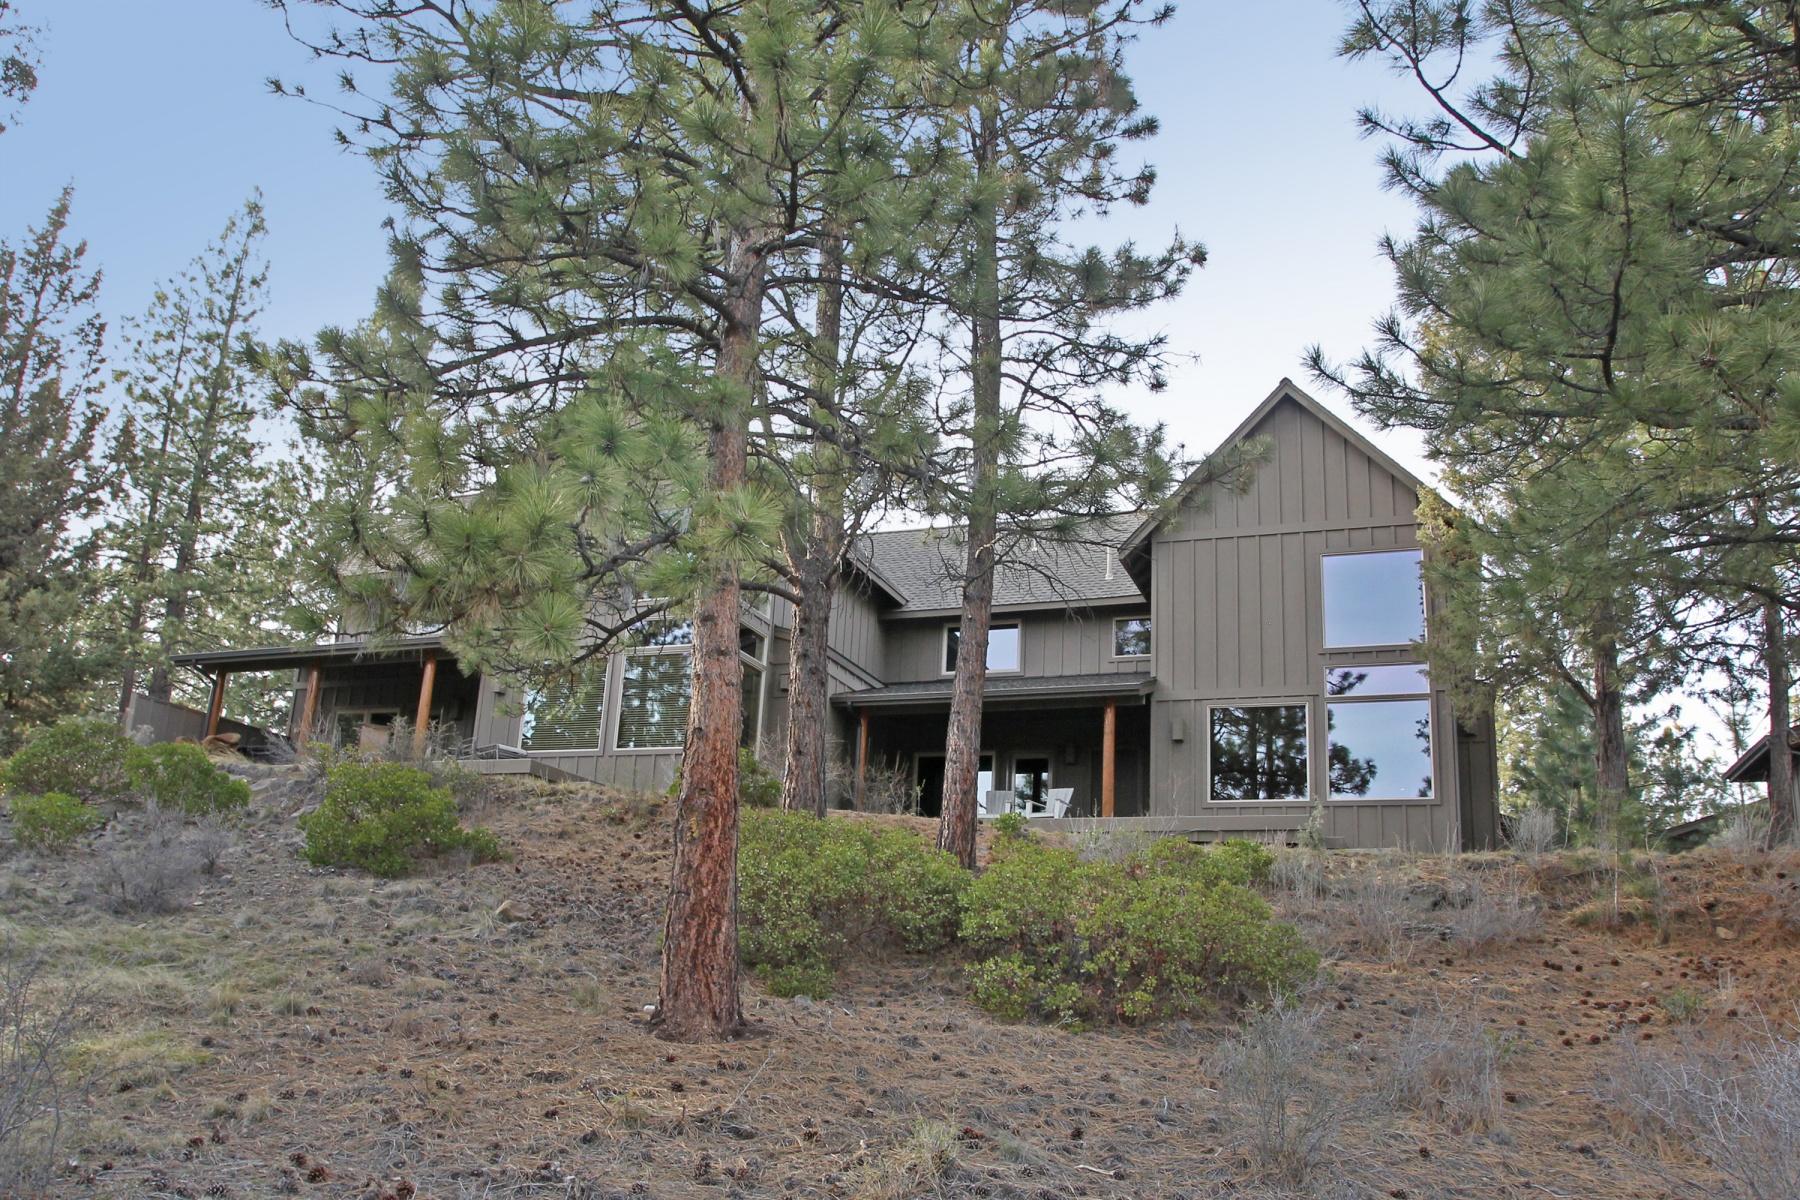 Moradia para Venda às River Wild 61357 Wild Rapids Dr Bend, Oregon 97702 Estados Unidos